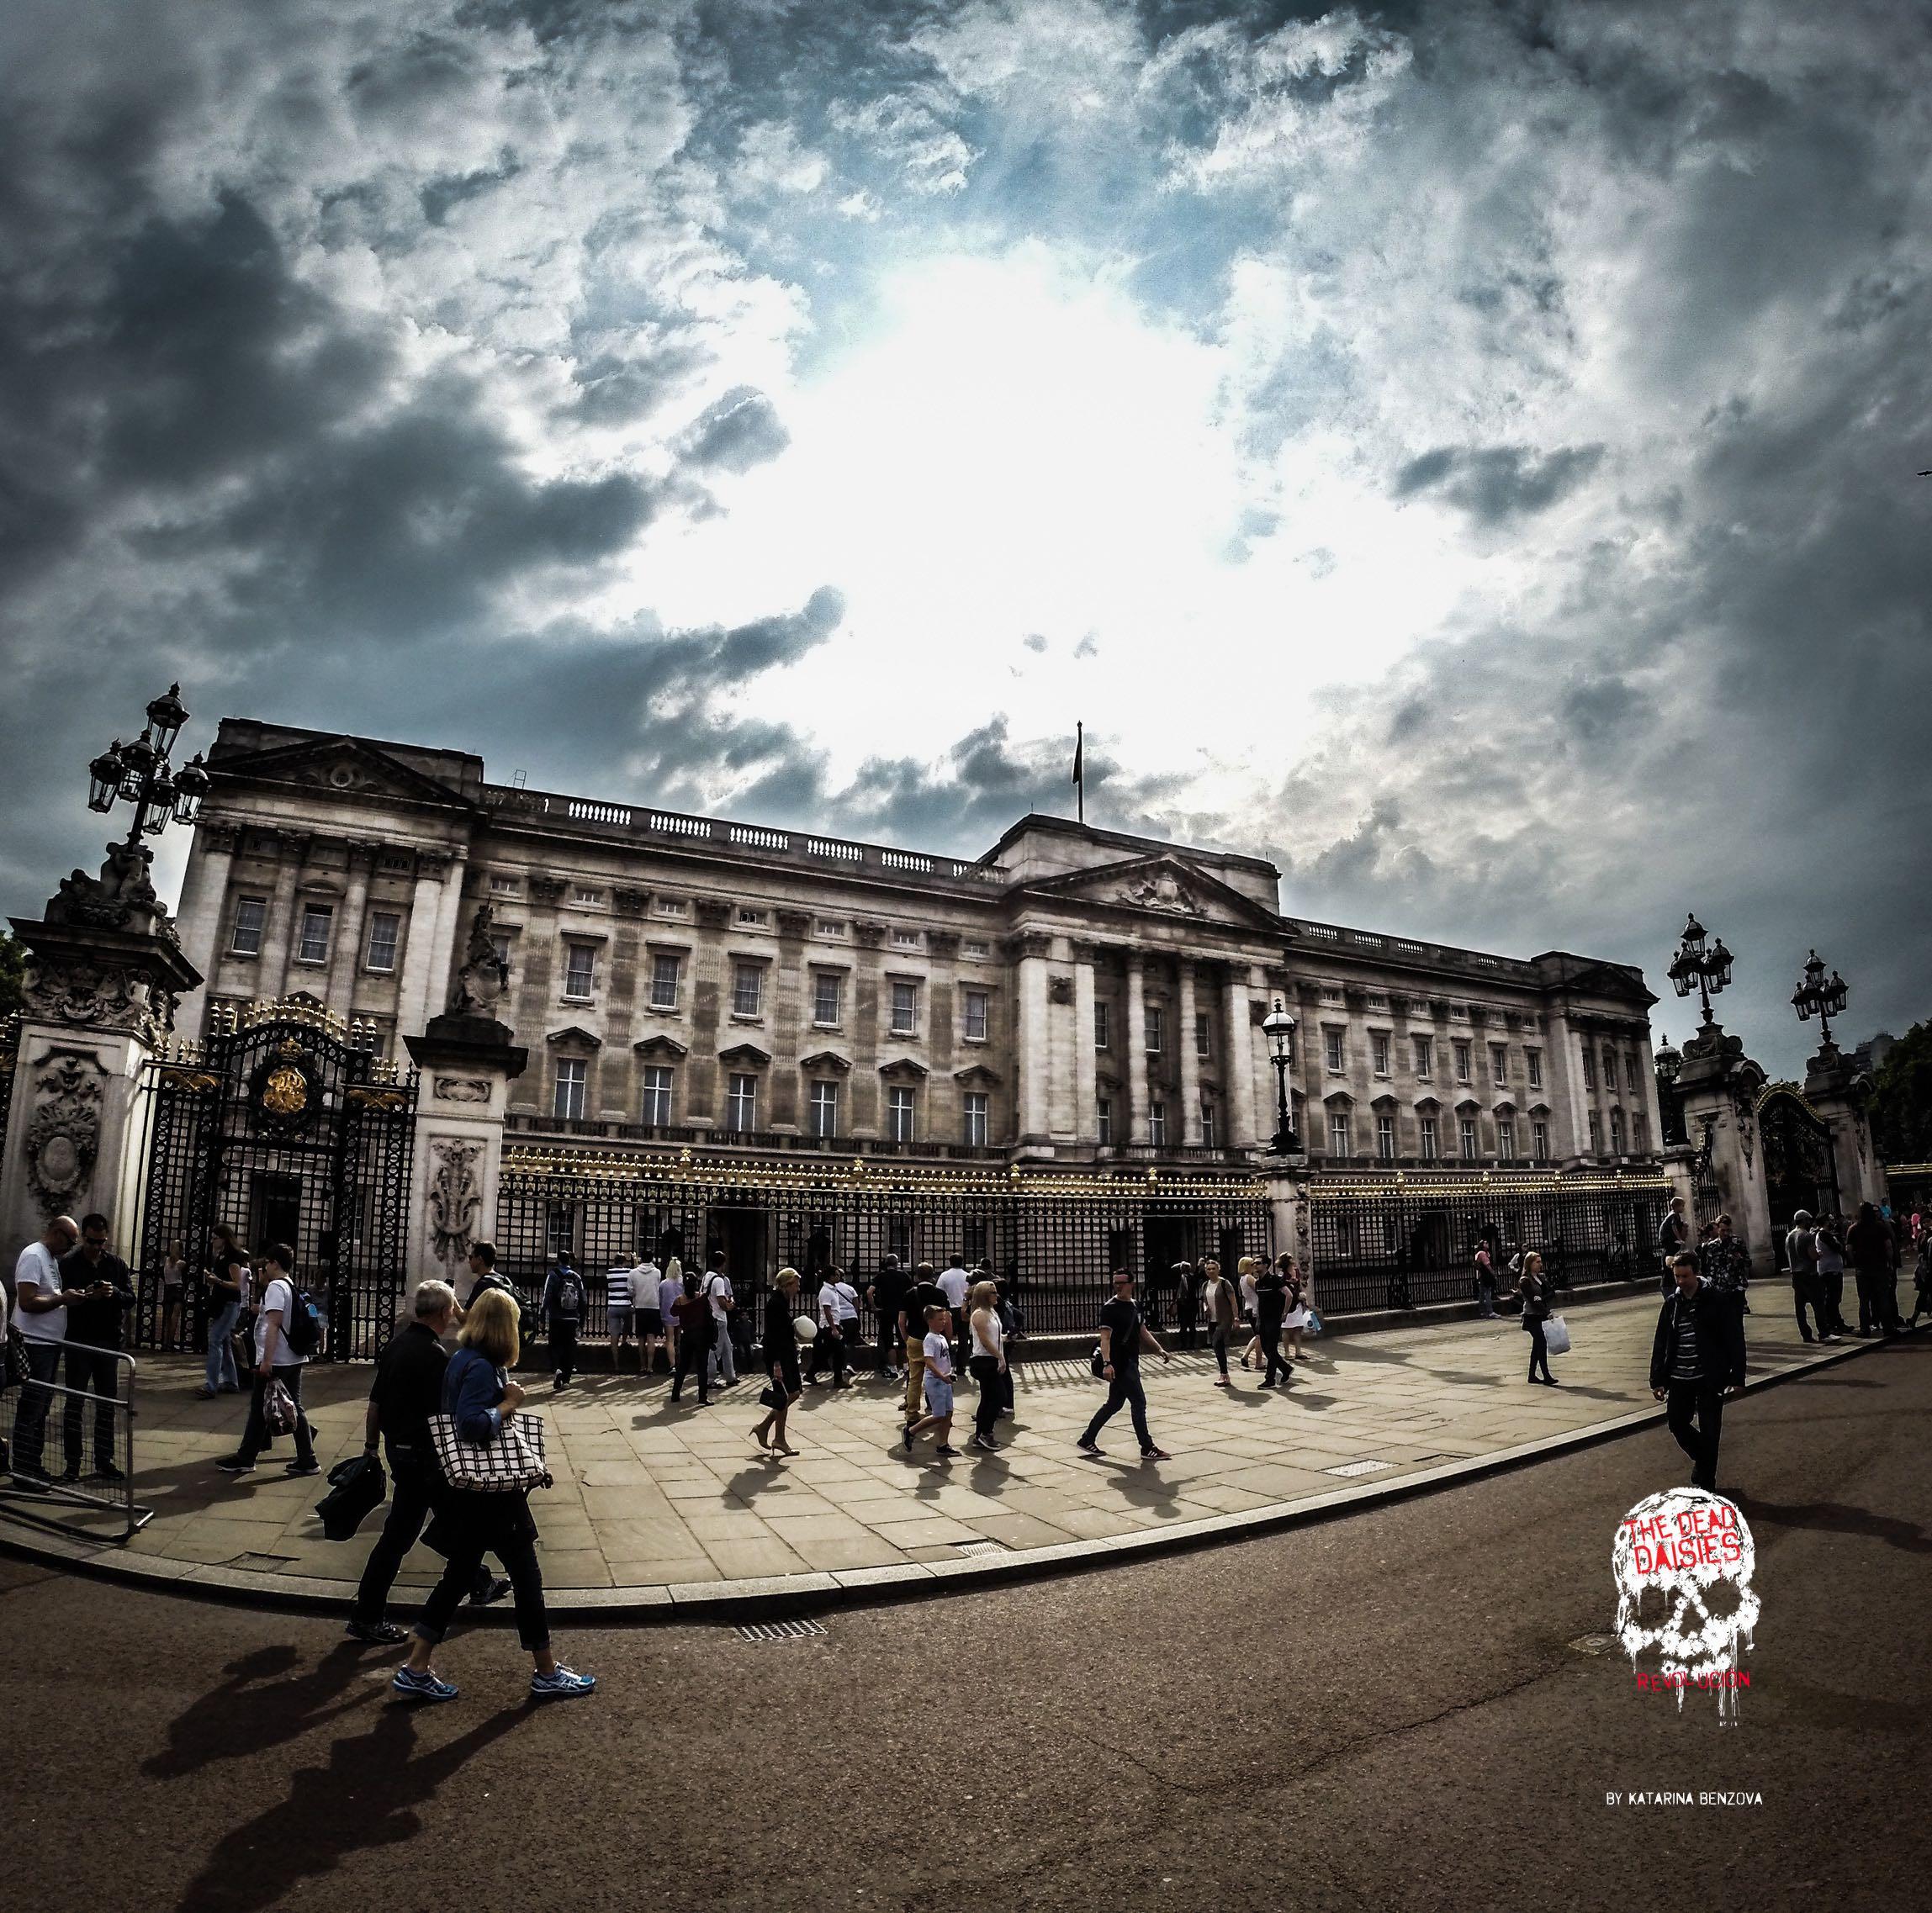 DAY 15, LONDON, UK